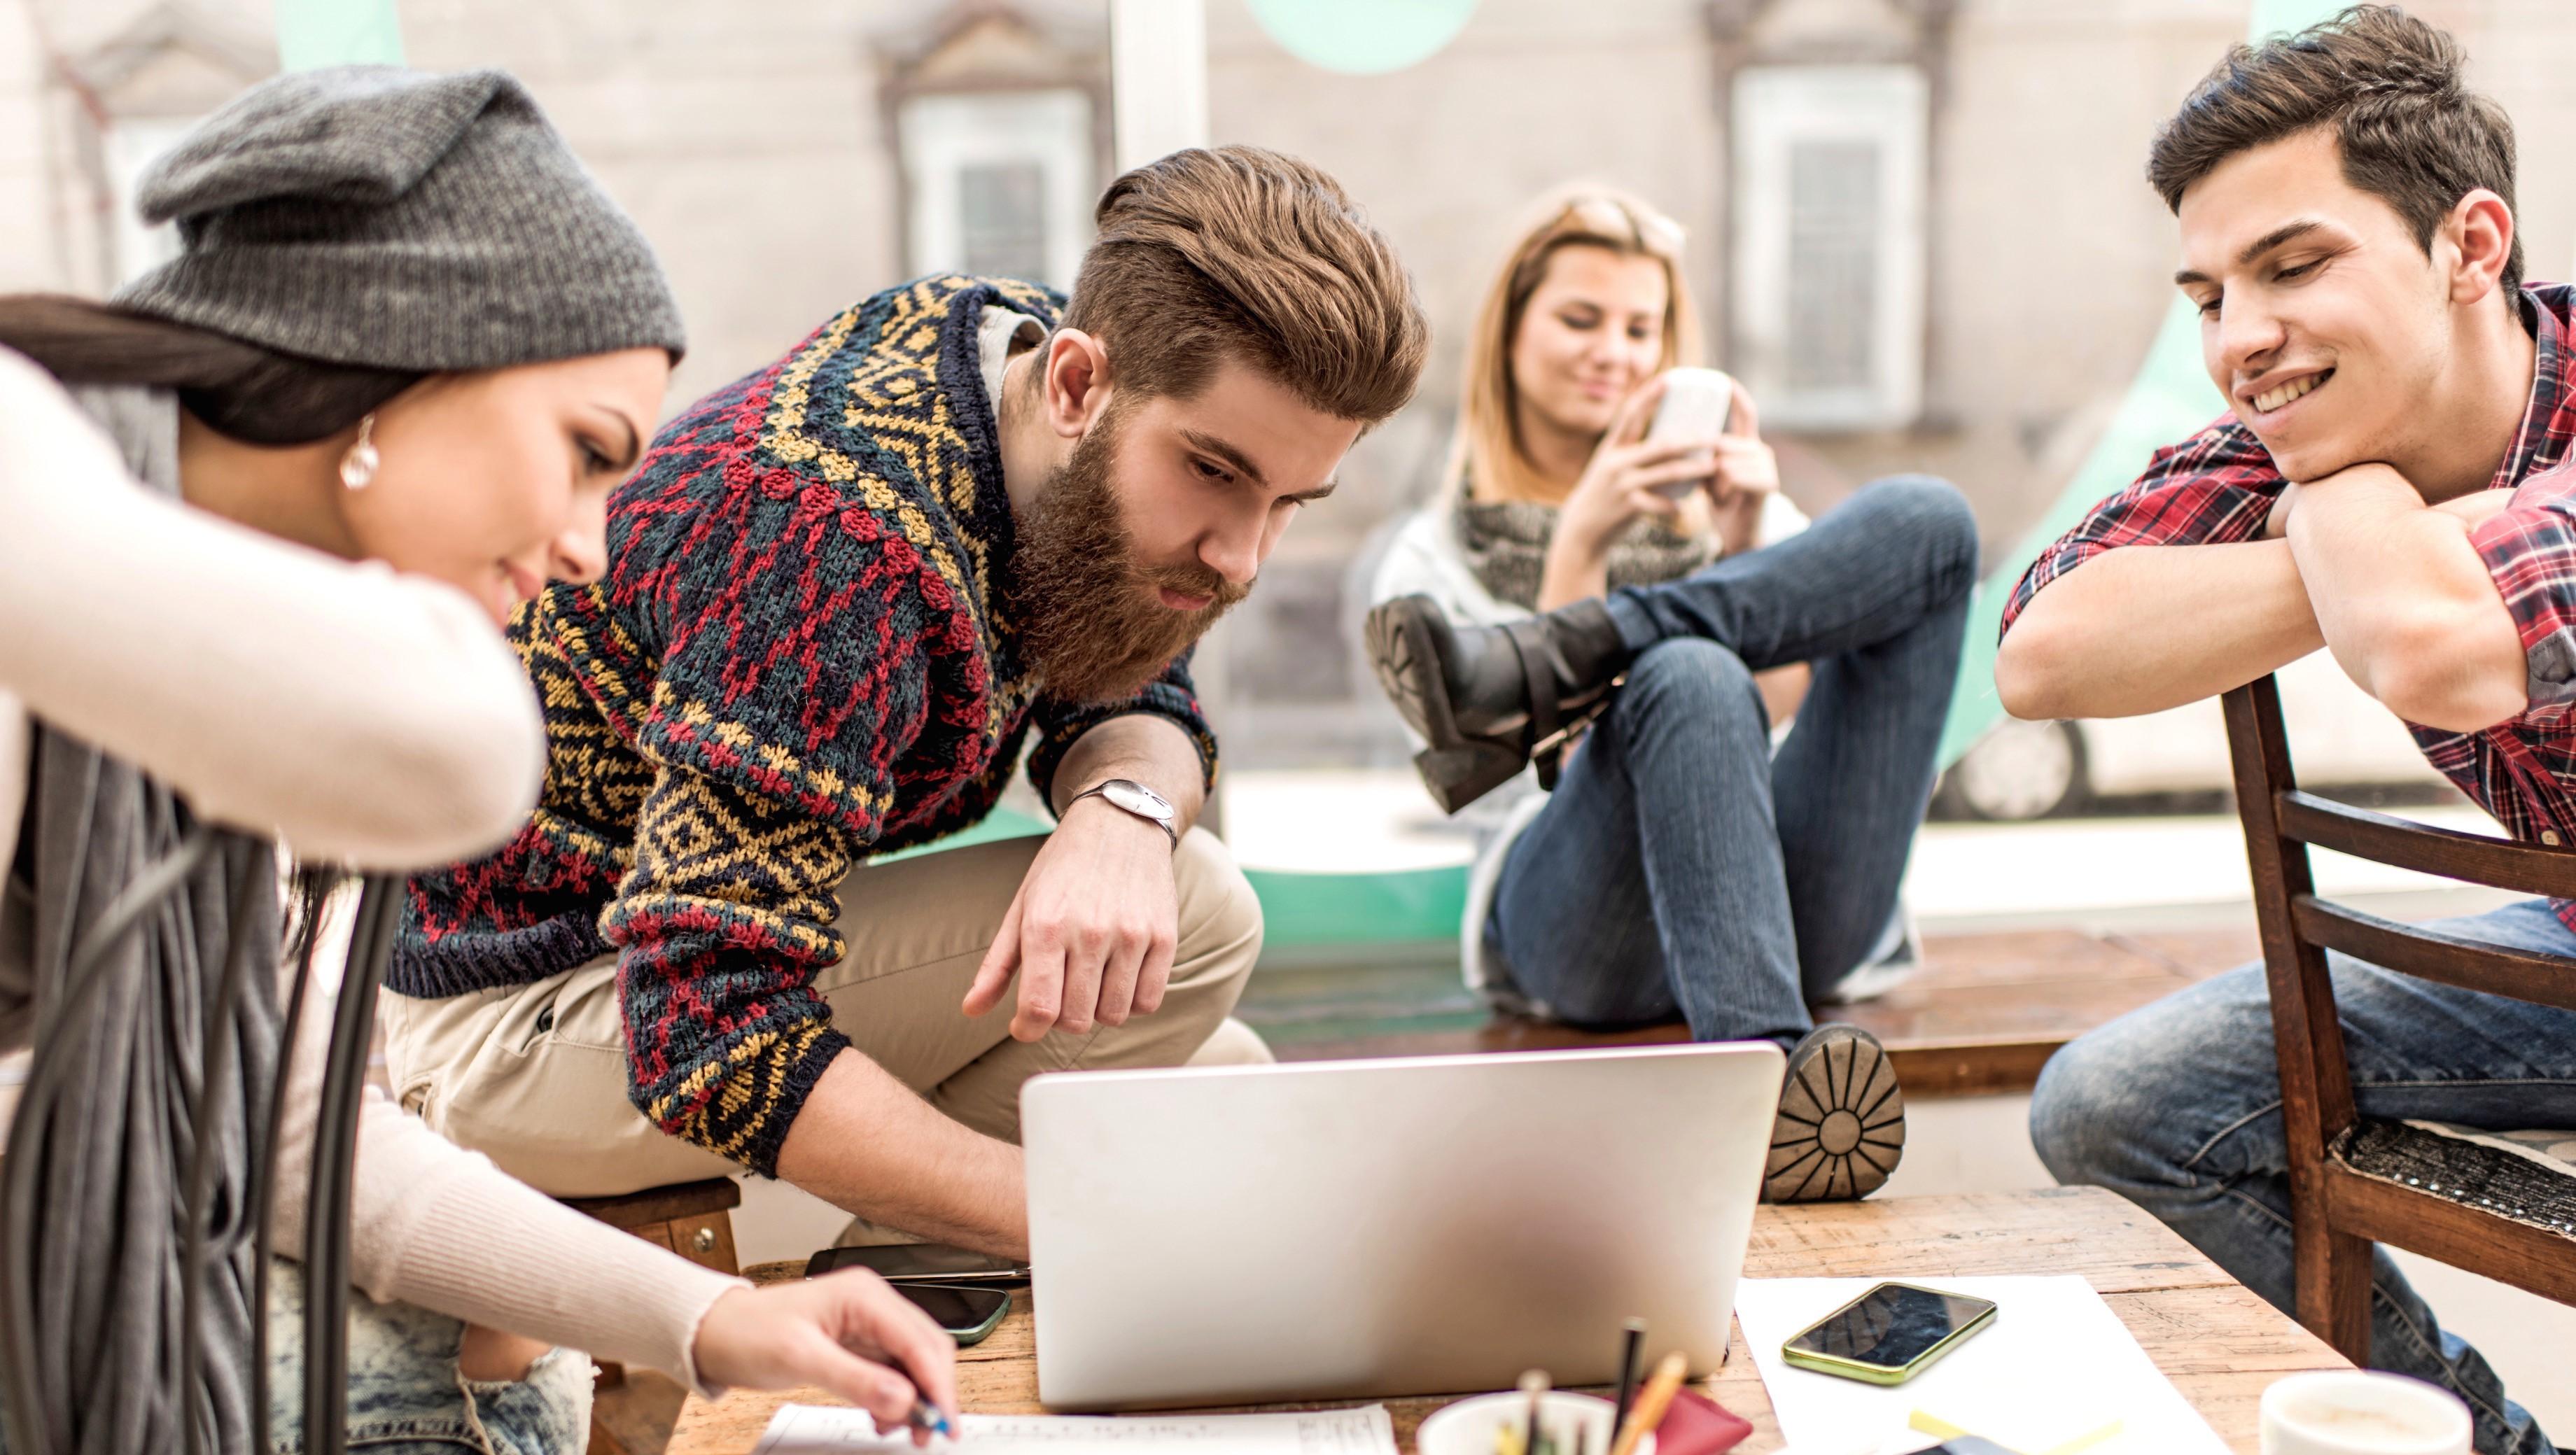 carrière jongeren millenials inspanning concentratie